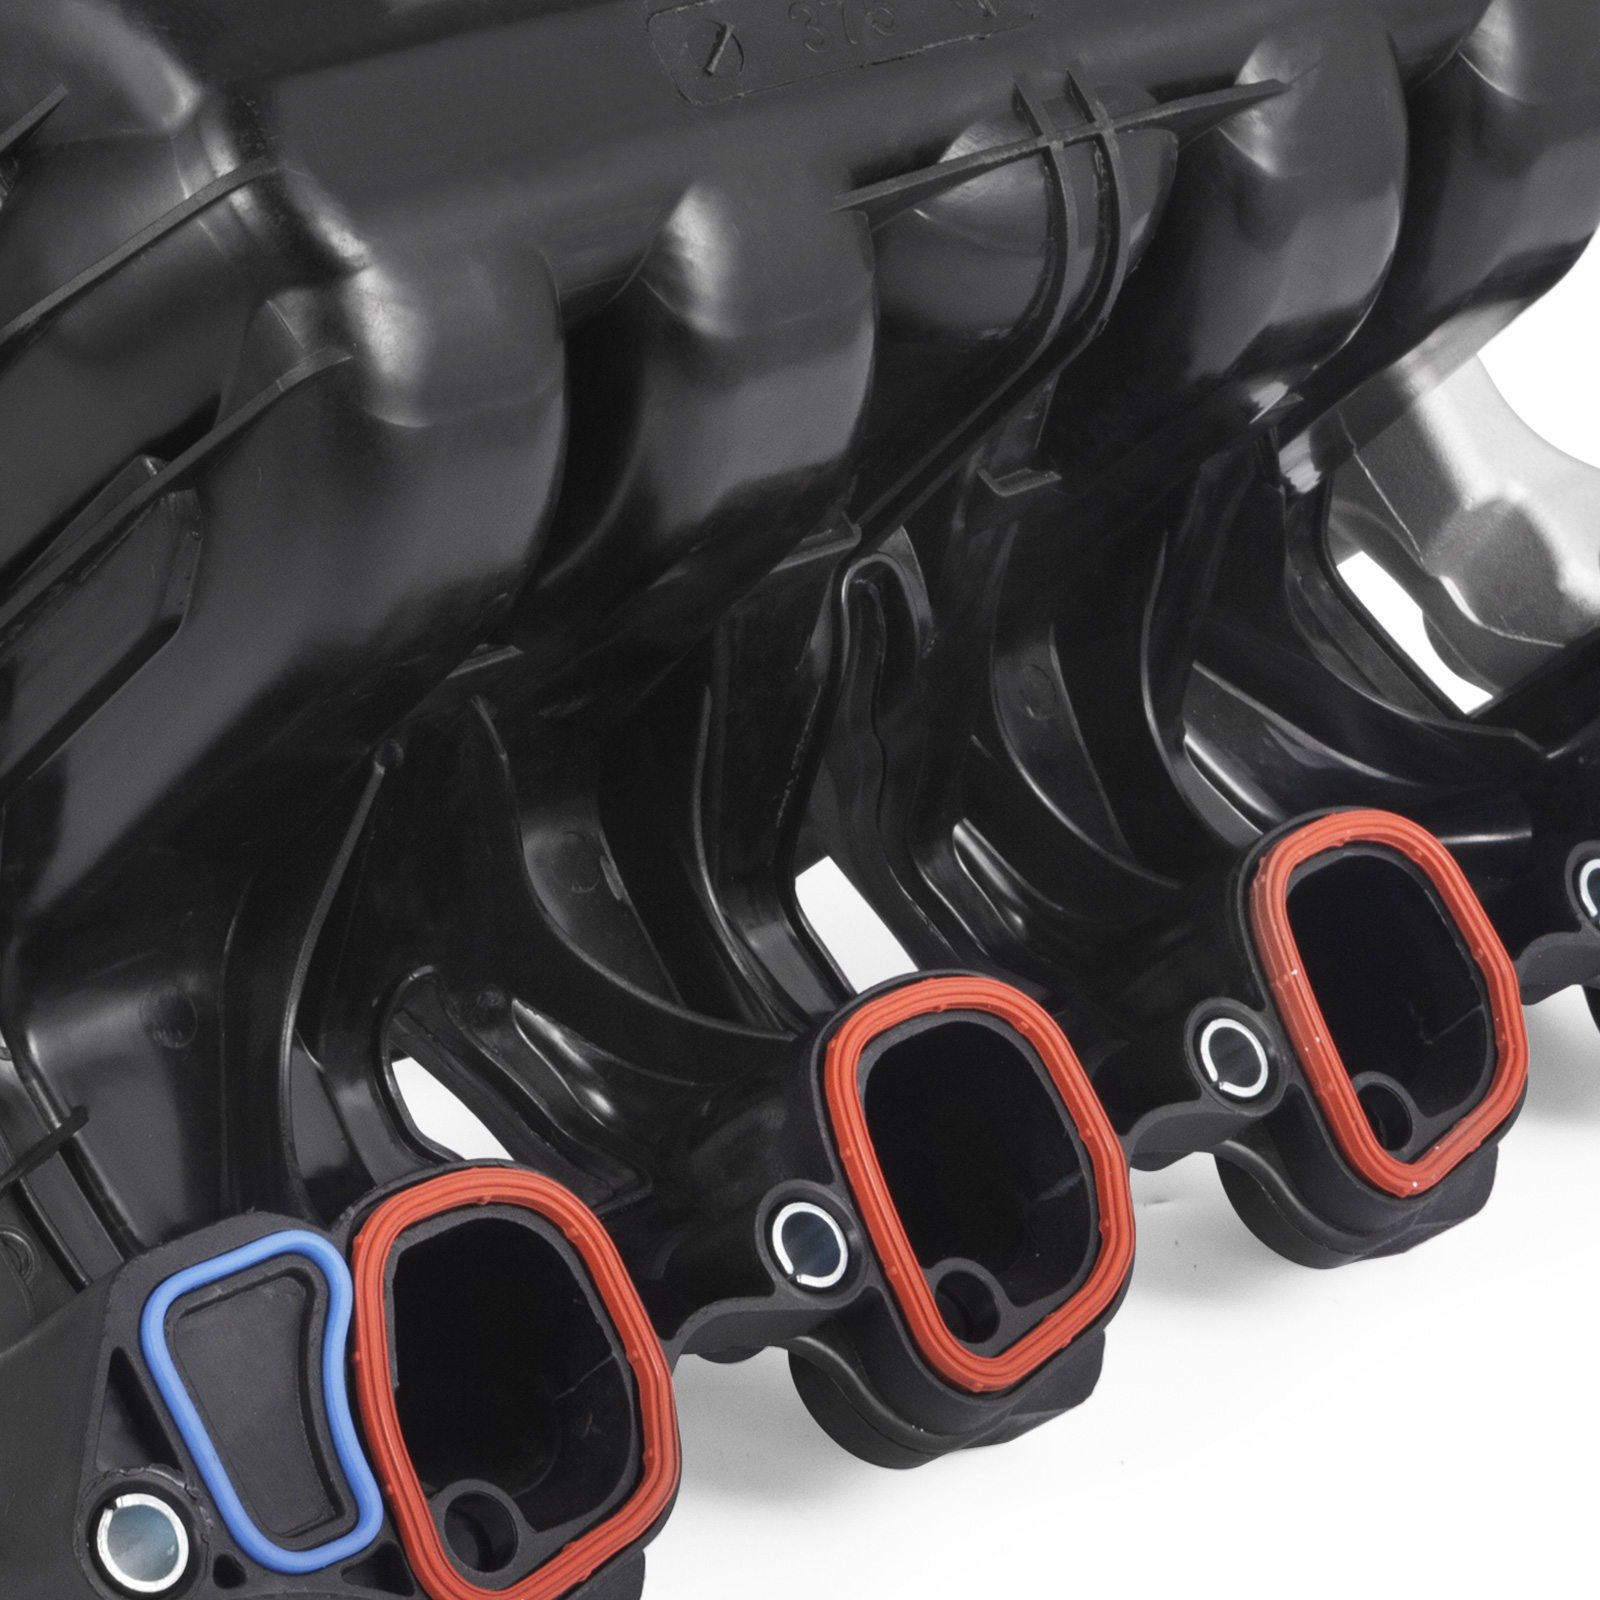 Pop Engine Intake Manifold Upper 615-375 fits 07-08 Ford F-150 4.6L-V8 Car